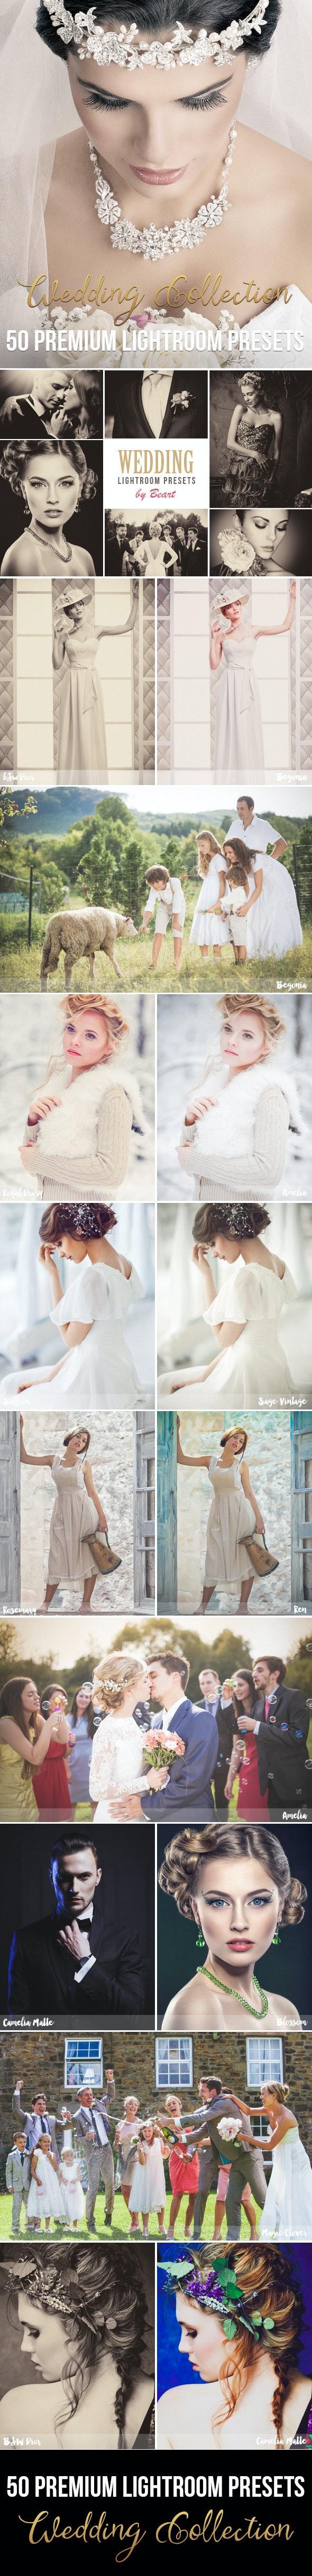 50 Premium Wedding Lightroom Presets - Wedding Lightroom Presets